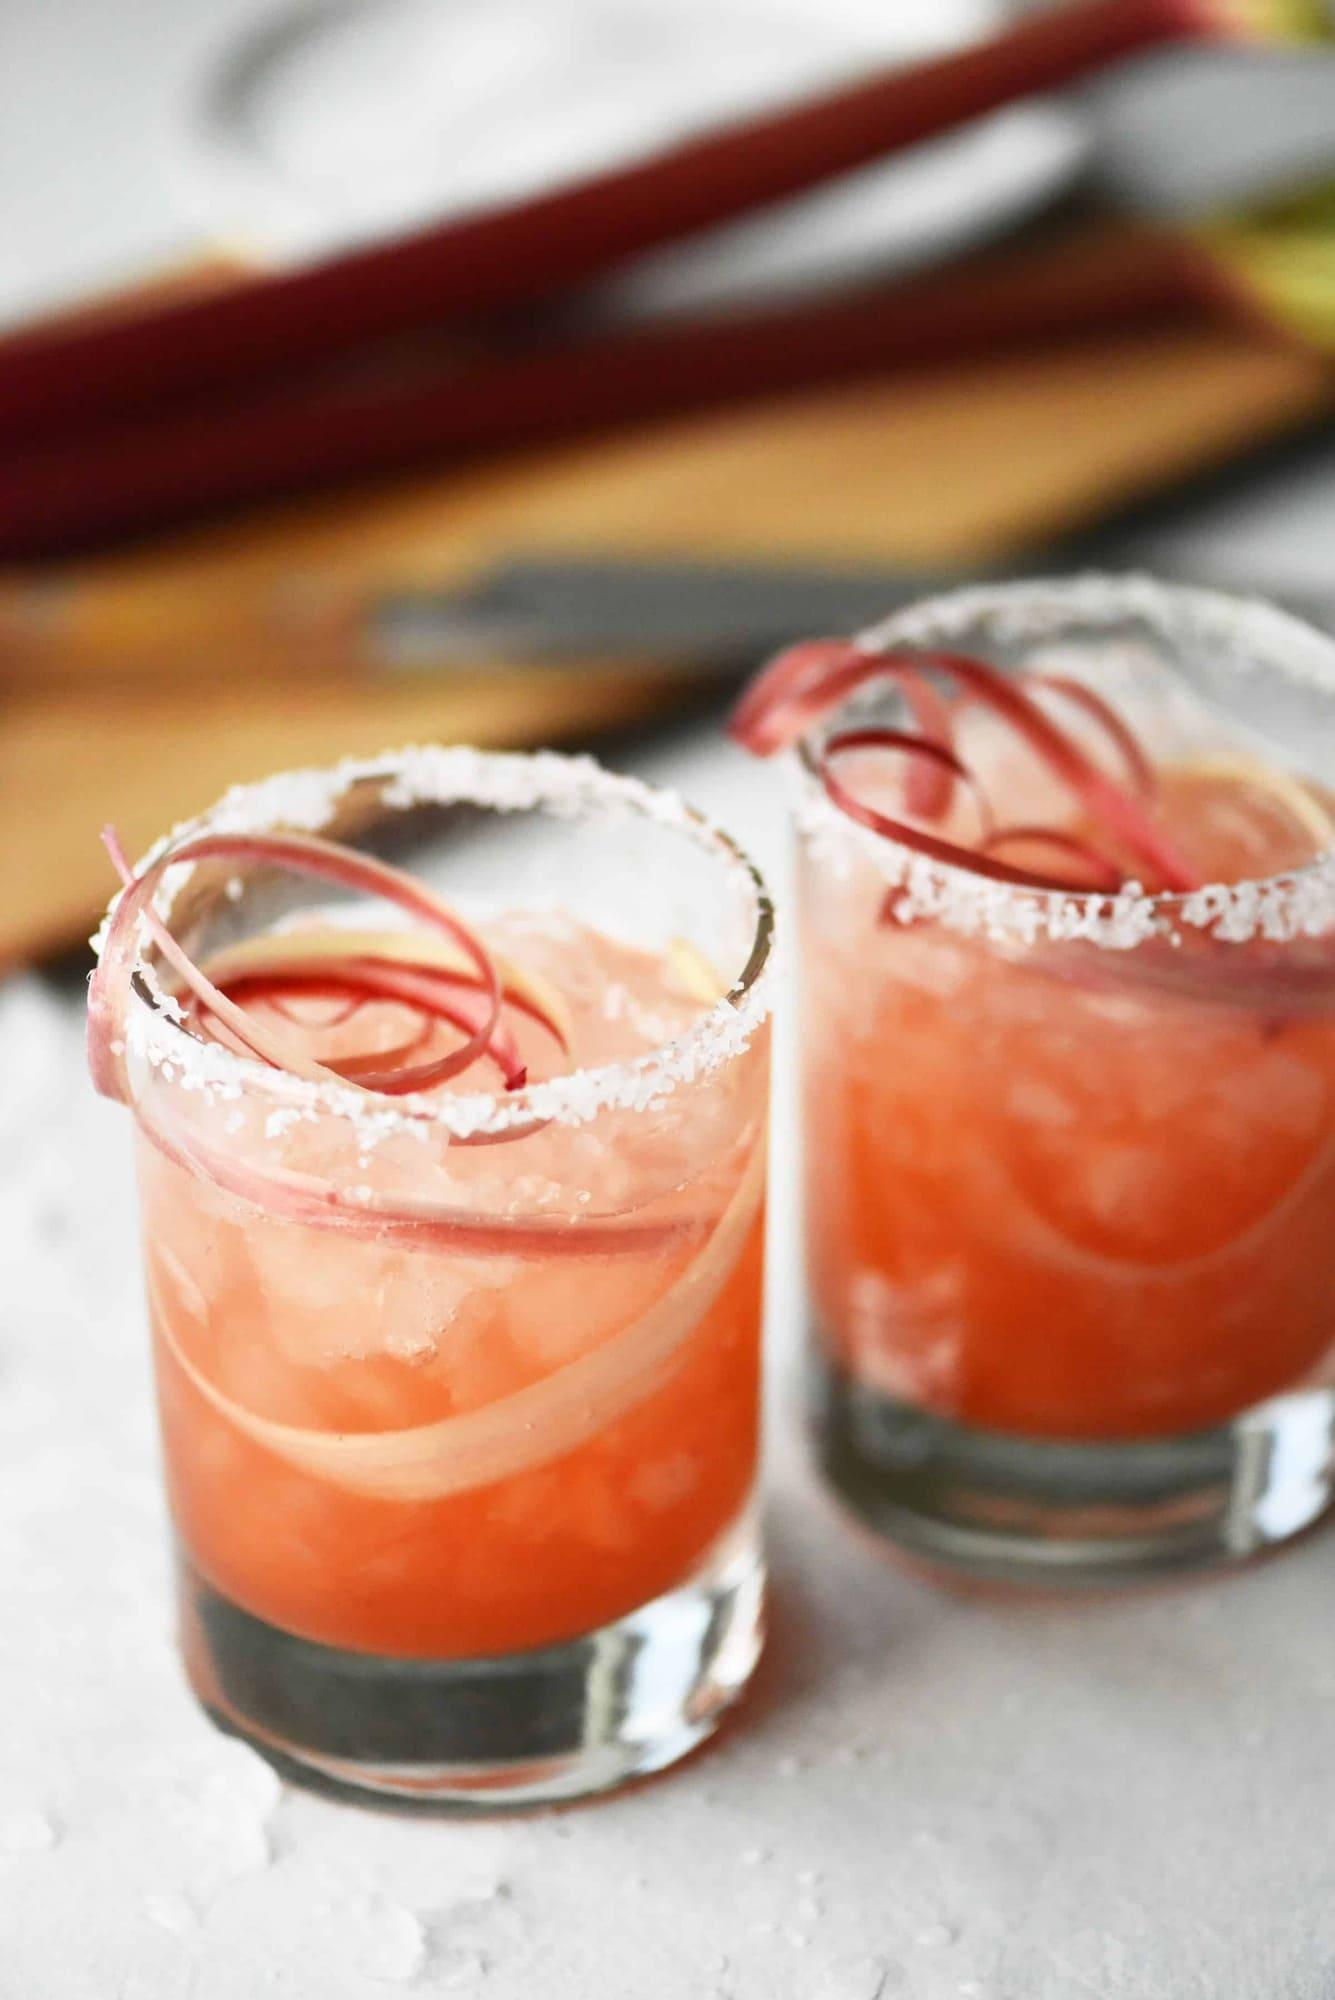 Pouring raspberry rhubarb margarita into glass with rhubarb ribbons